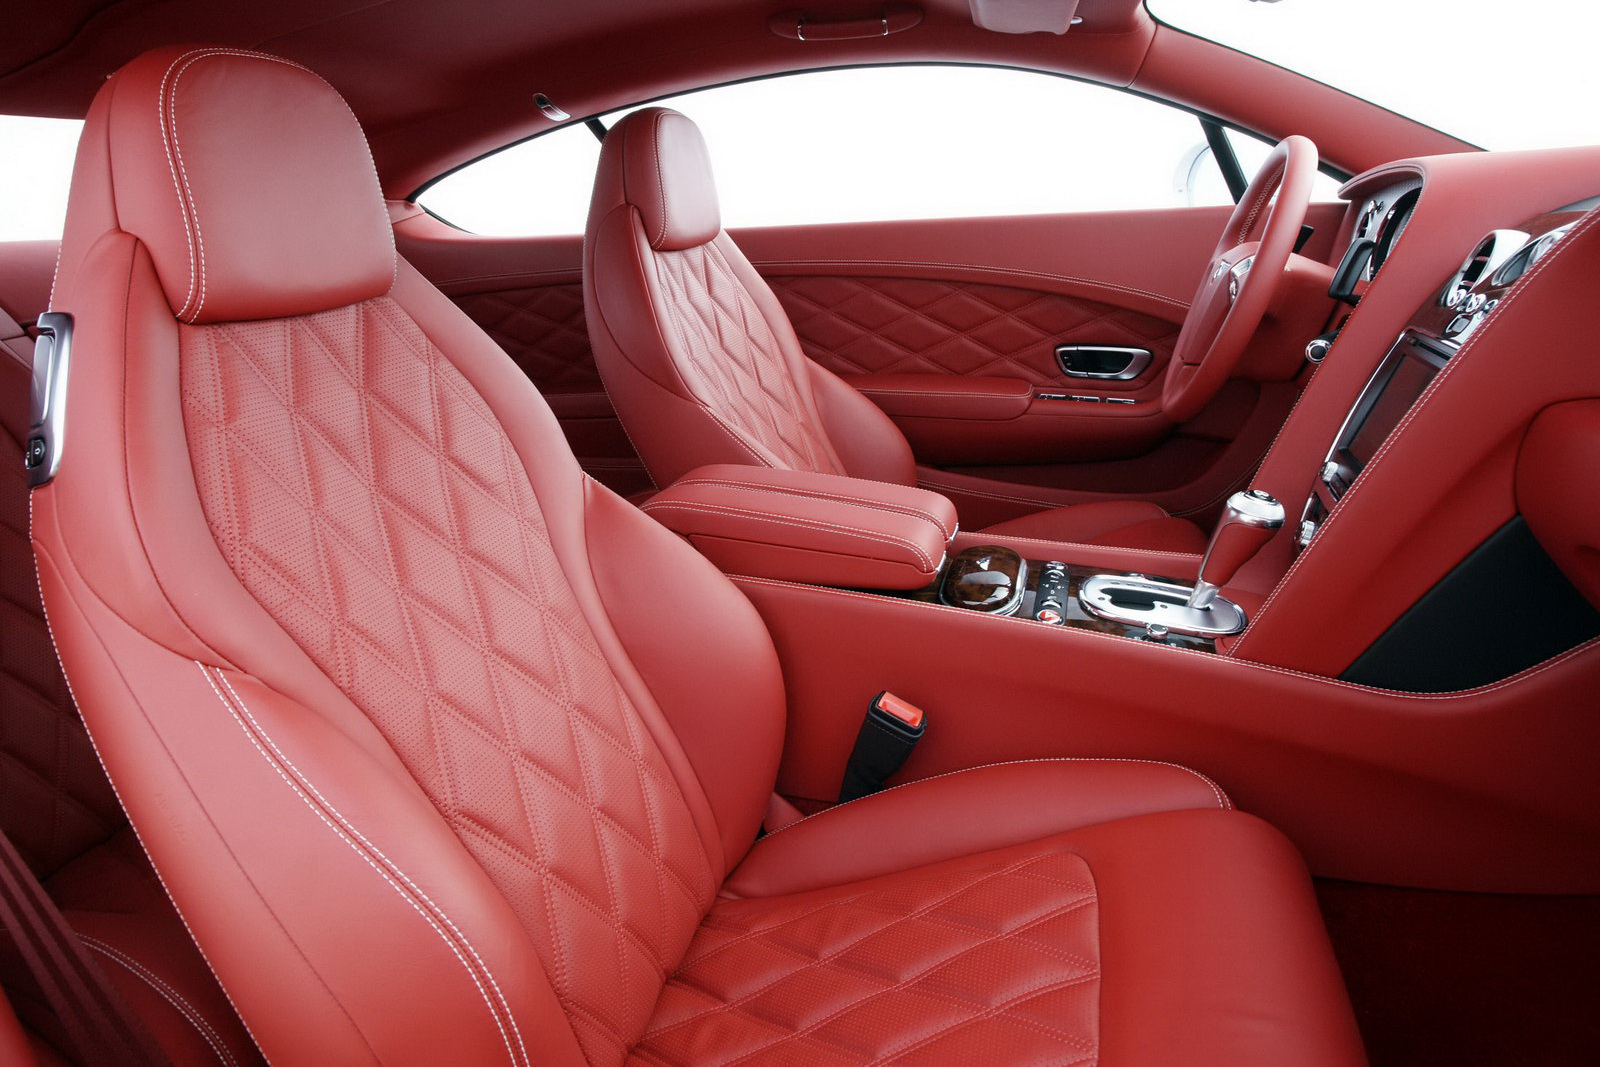 2011 Bentley Continental Gt Photos Amp Specs